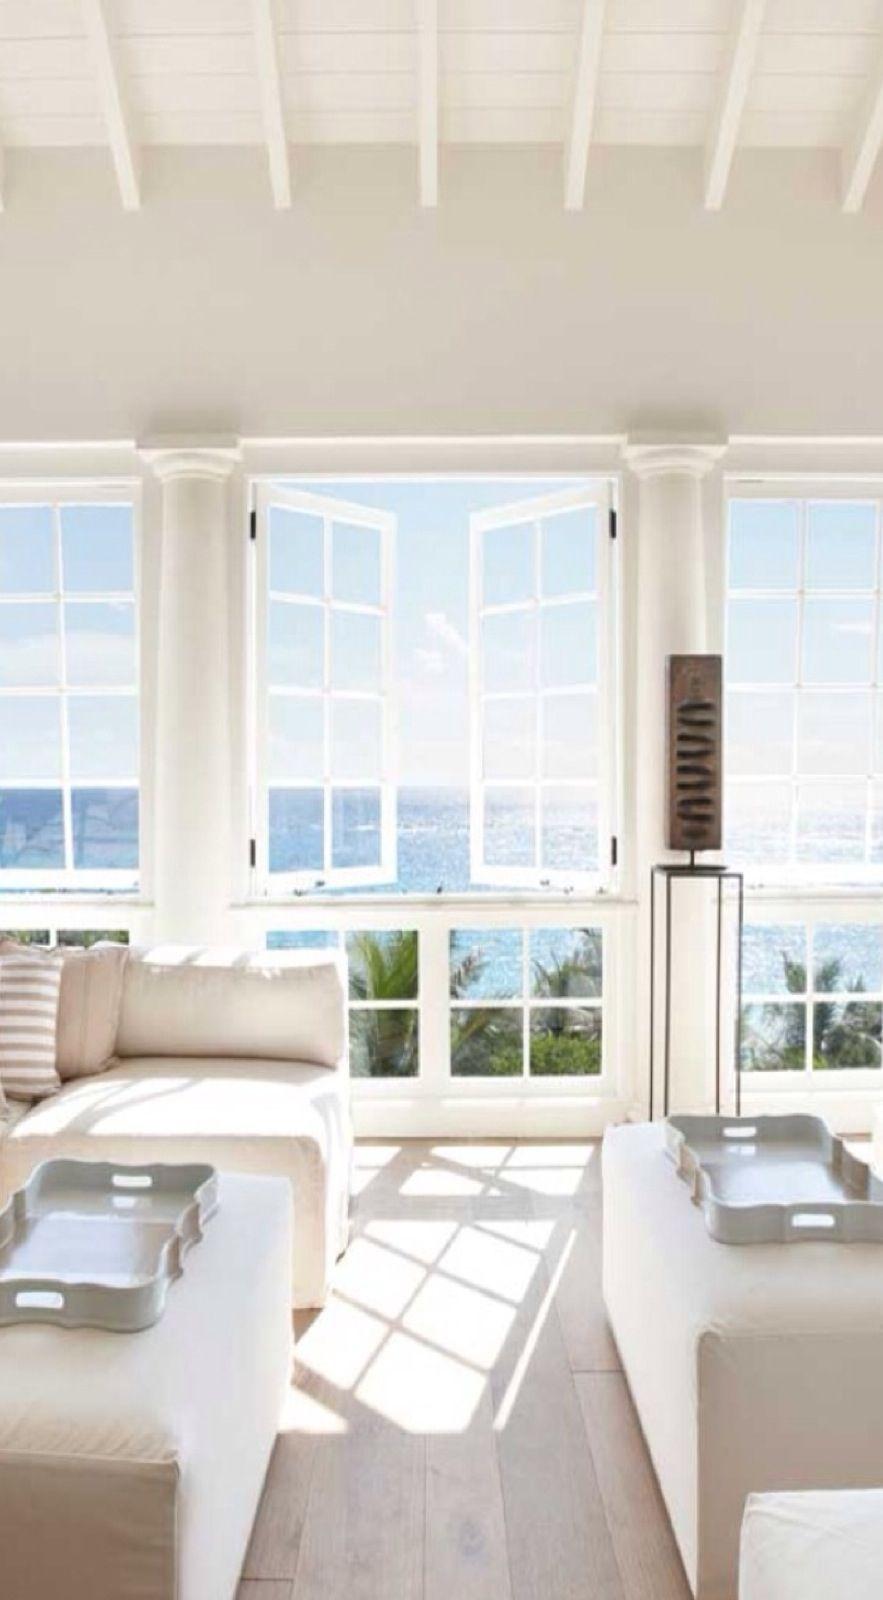 decoration du blanc pour illuminer l ete home luxury interiors and homes